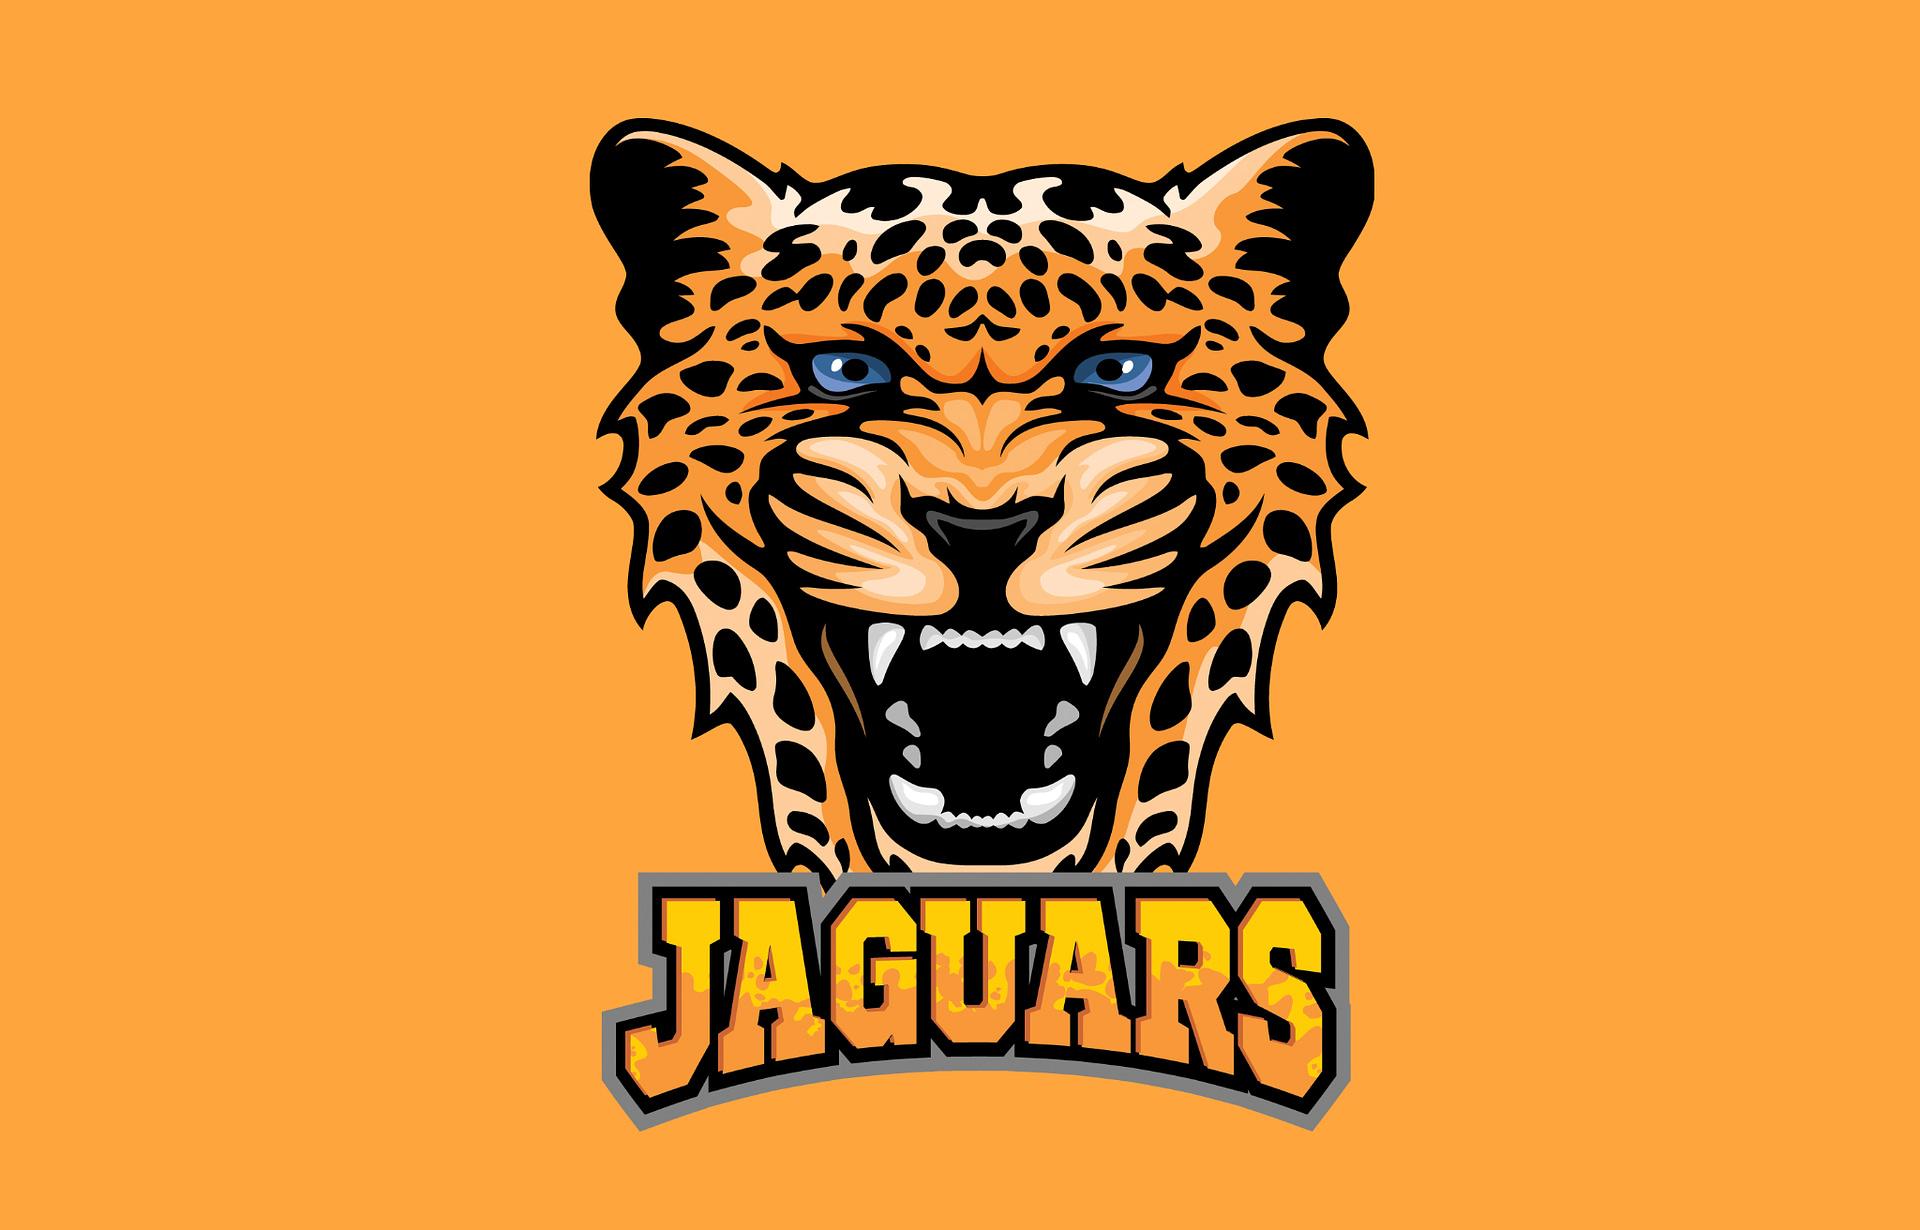 Legacy FC Jaguars